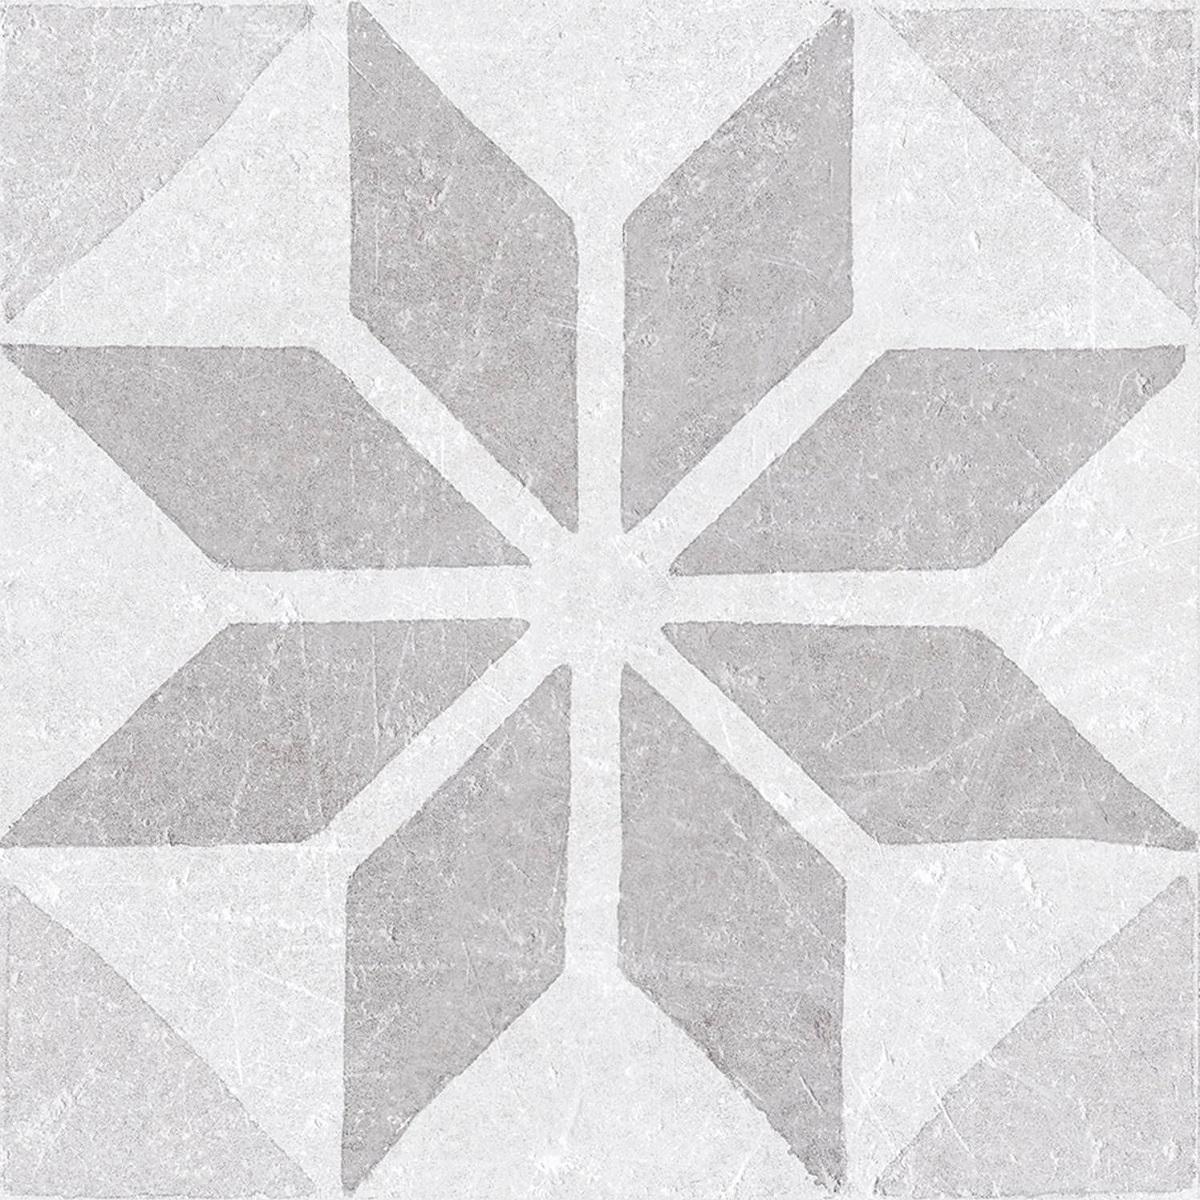 Jabo Materia Decor vloertegel star pearl 20x20